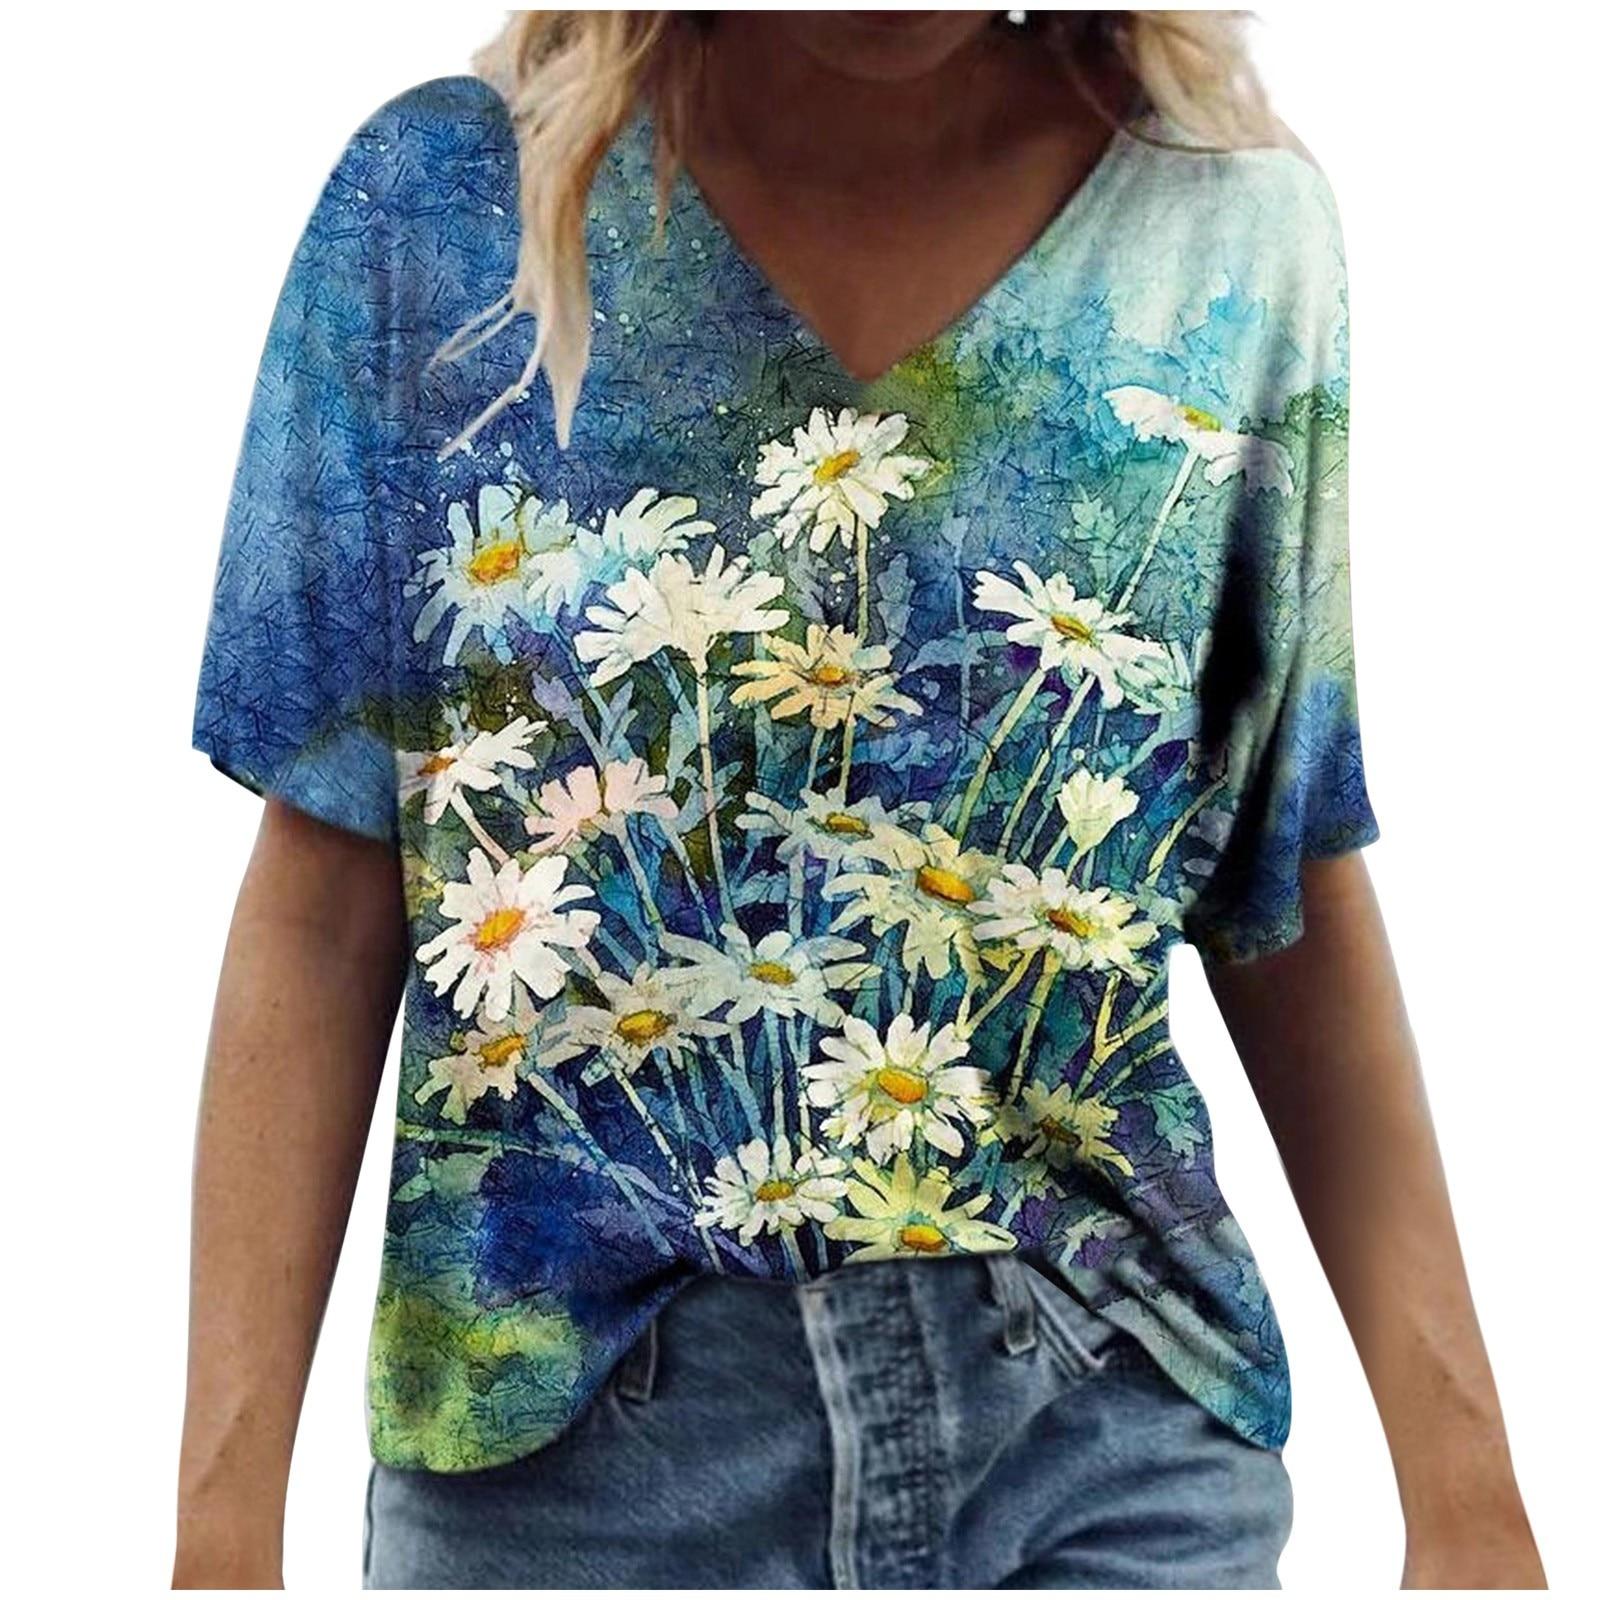 Vintage Frau T-shirts Frauen Sommer Blume Gedruckt Kurzarm V-ausschnitt T-Shirt Casual Tee Tops Graphic T Shirts Mujer Camisetas